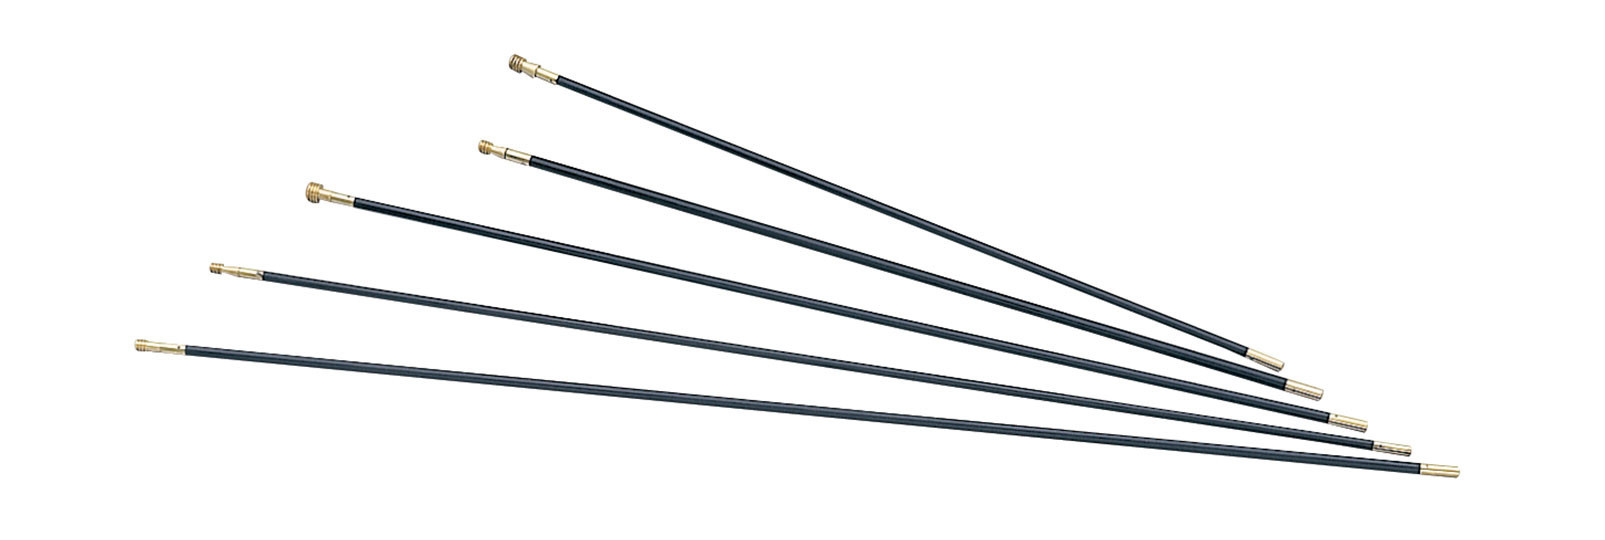 Bacchetta in fibra per armi avancarica 9x900 mm